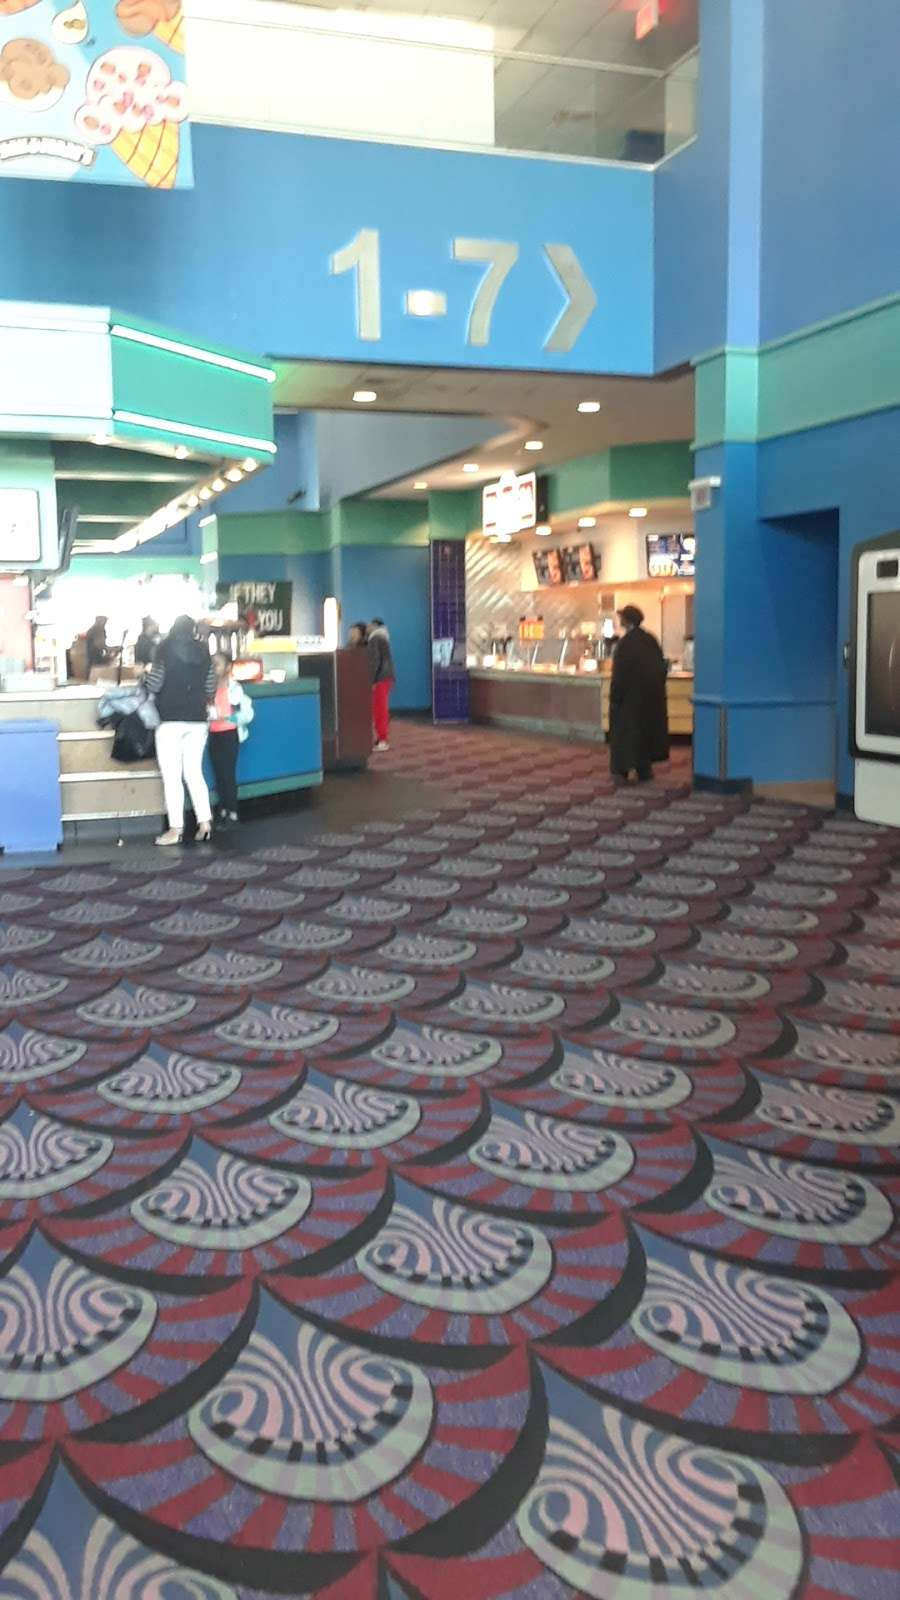 Linden Boulevard Multiplex Cinemas - movie theater  | Photo 10 of 10 | Address: 2784 Linden Blvd, Brooklyn, NY 11208, USA | Phone: (800) 315-4000